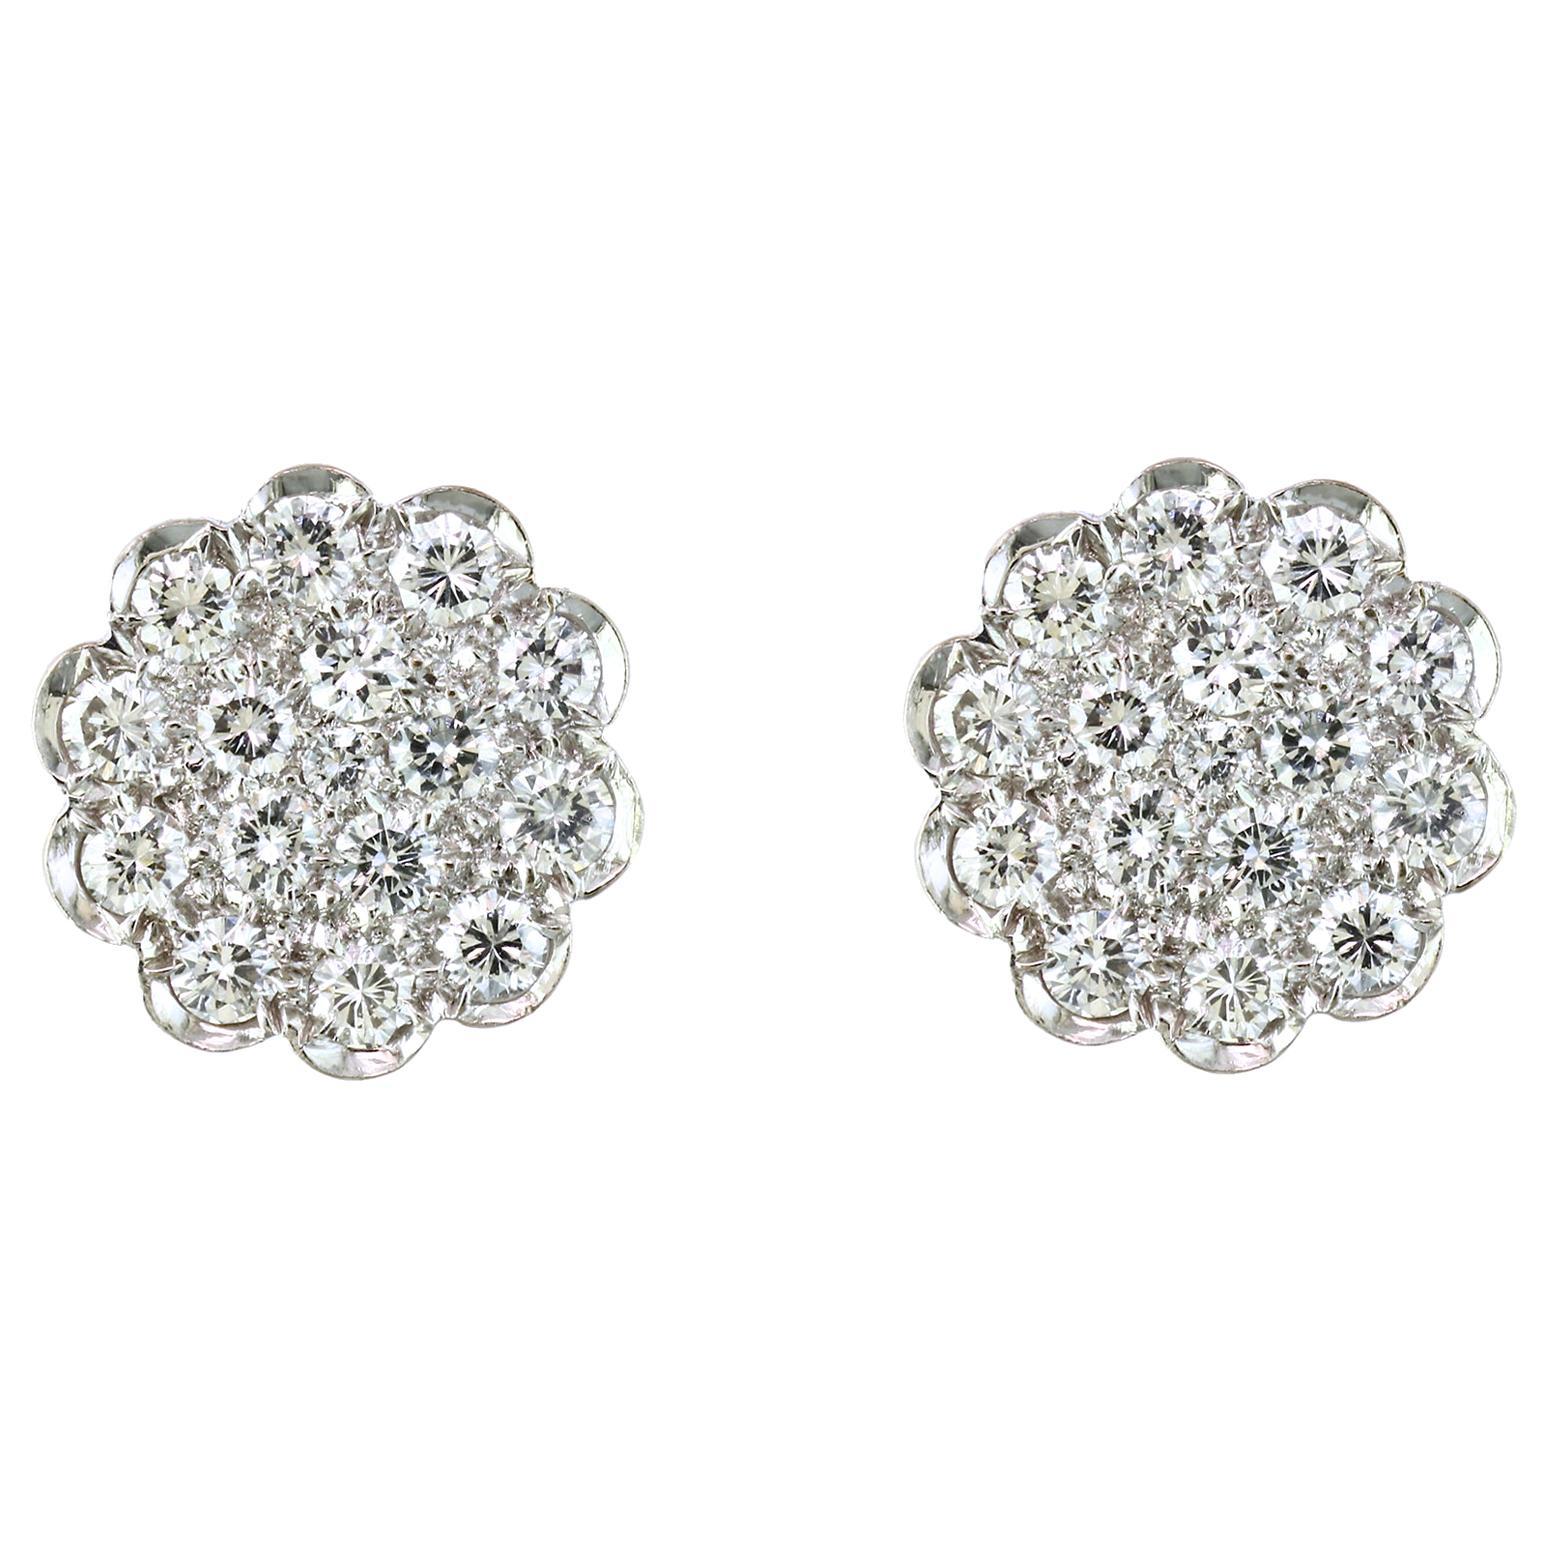 2 Carat Diamond Floral Cluster Flower Stud Earrings in 14 Karat White Gold